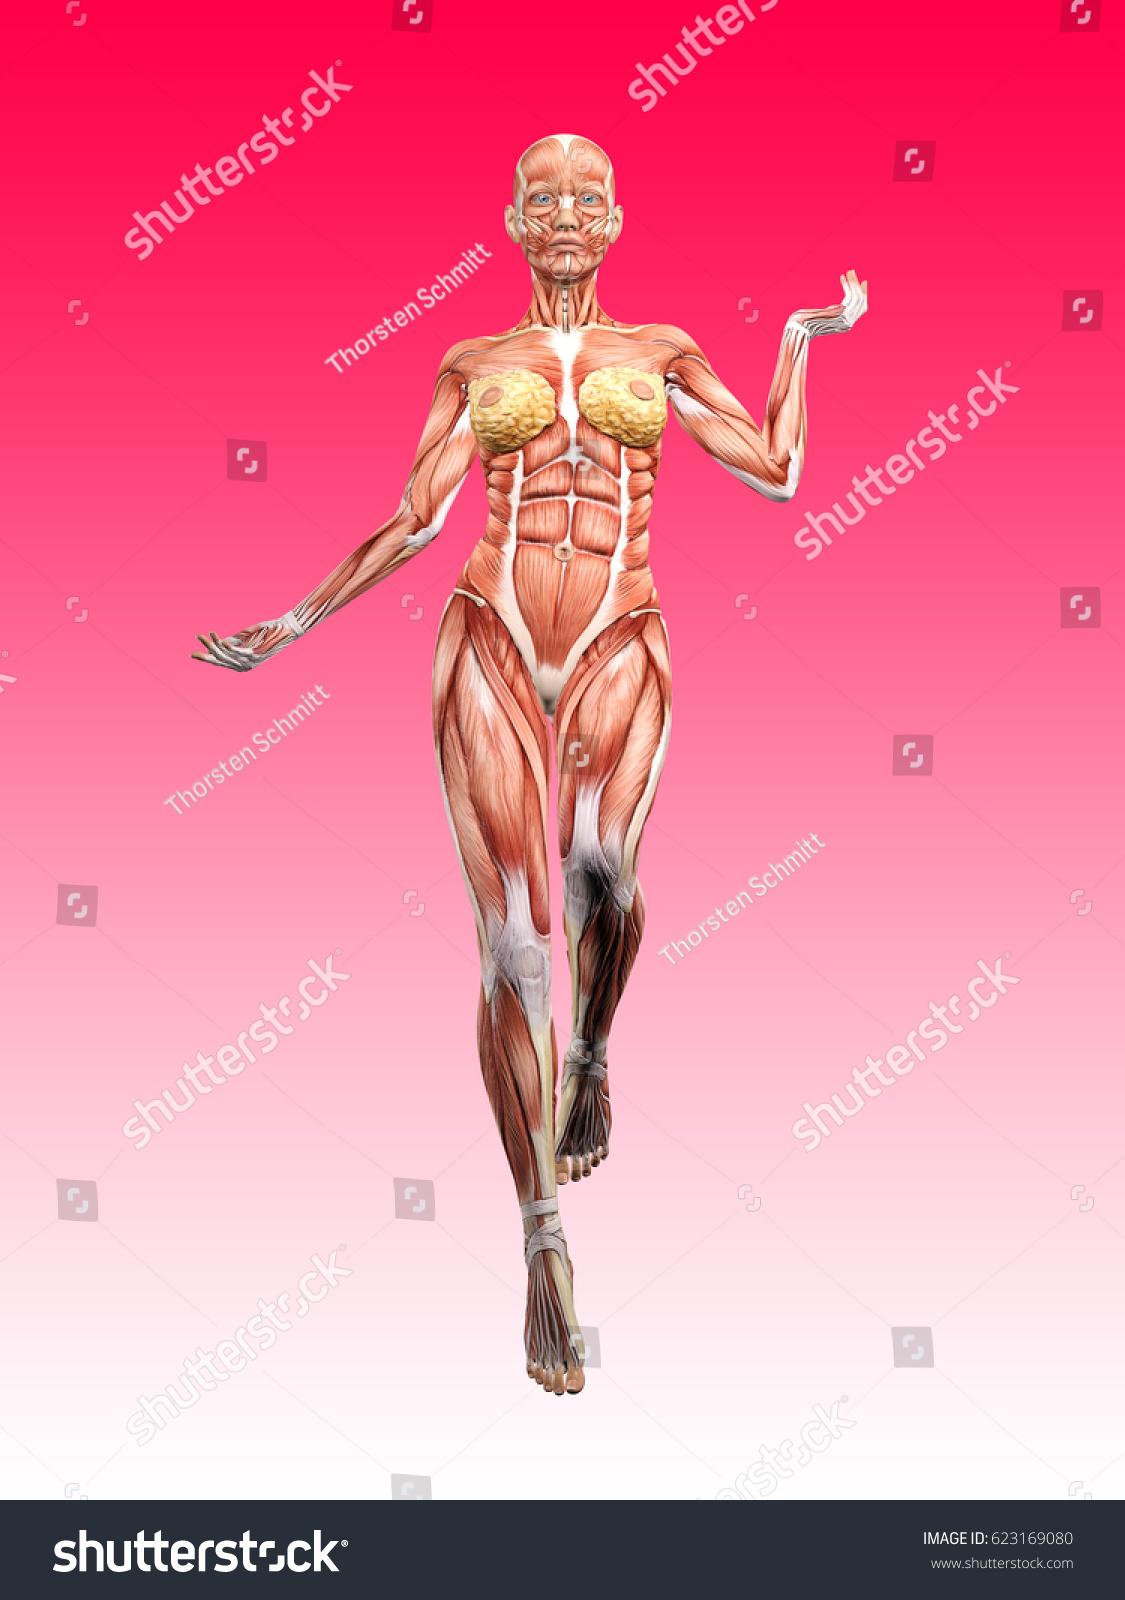 Female Muscle Anatomy Dancing 3 D Illustration Stock Illustration